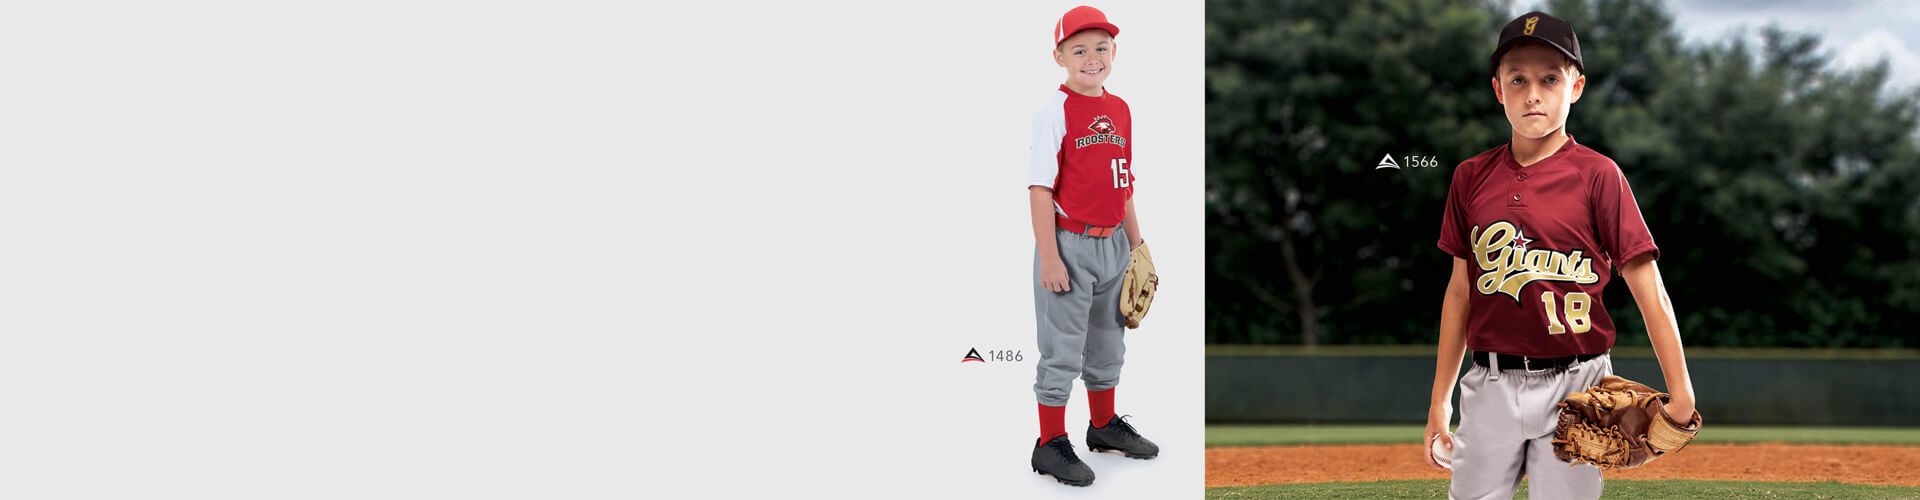 Youth baseball jerseys, hats, pants and uniforms